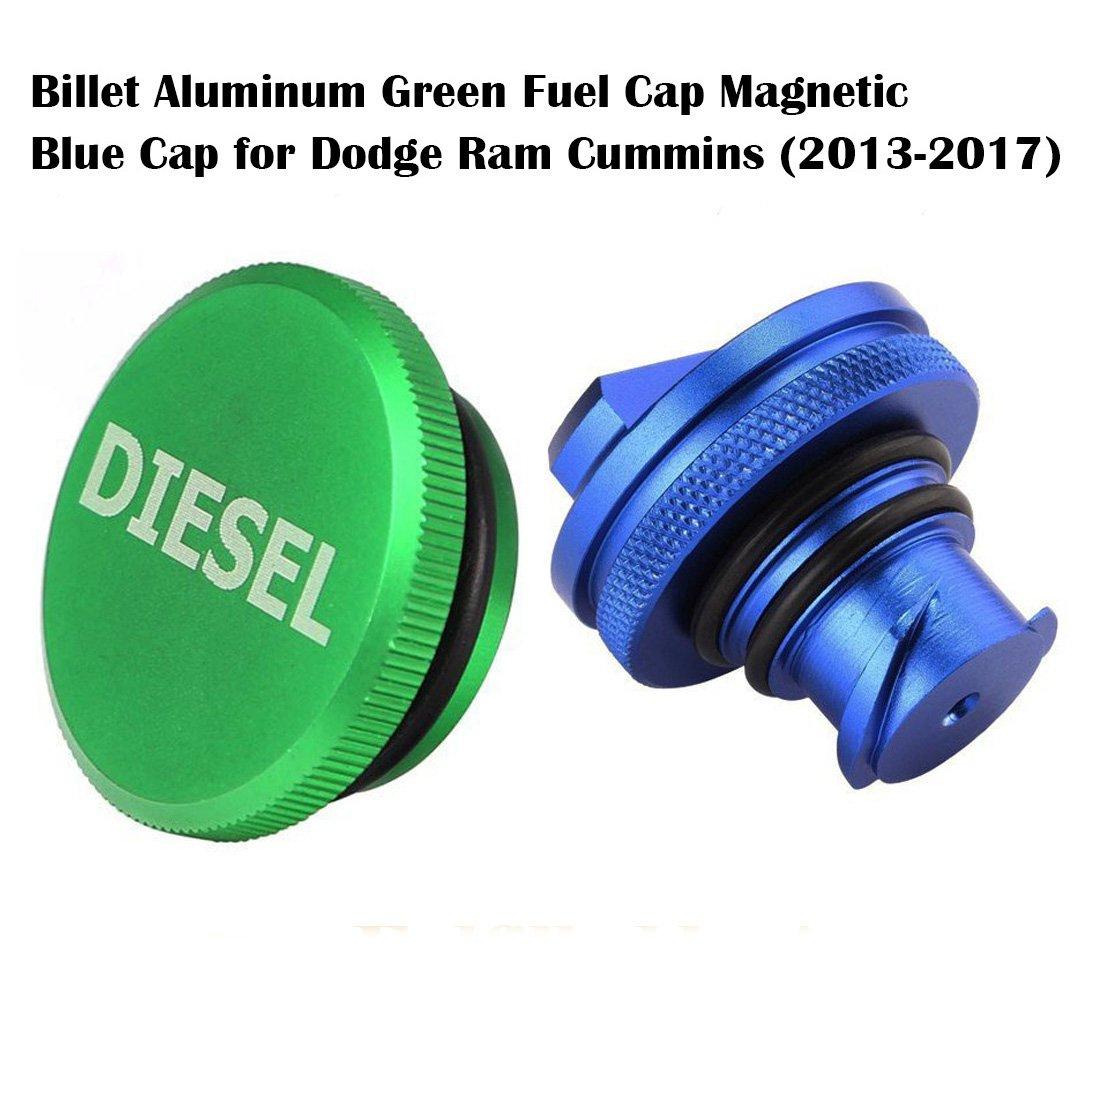 Diesel Billet Fuel Gas Oil Magnetic Cap Aluminum For Dodge Ram 2013-2017